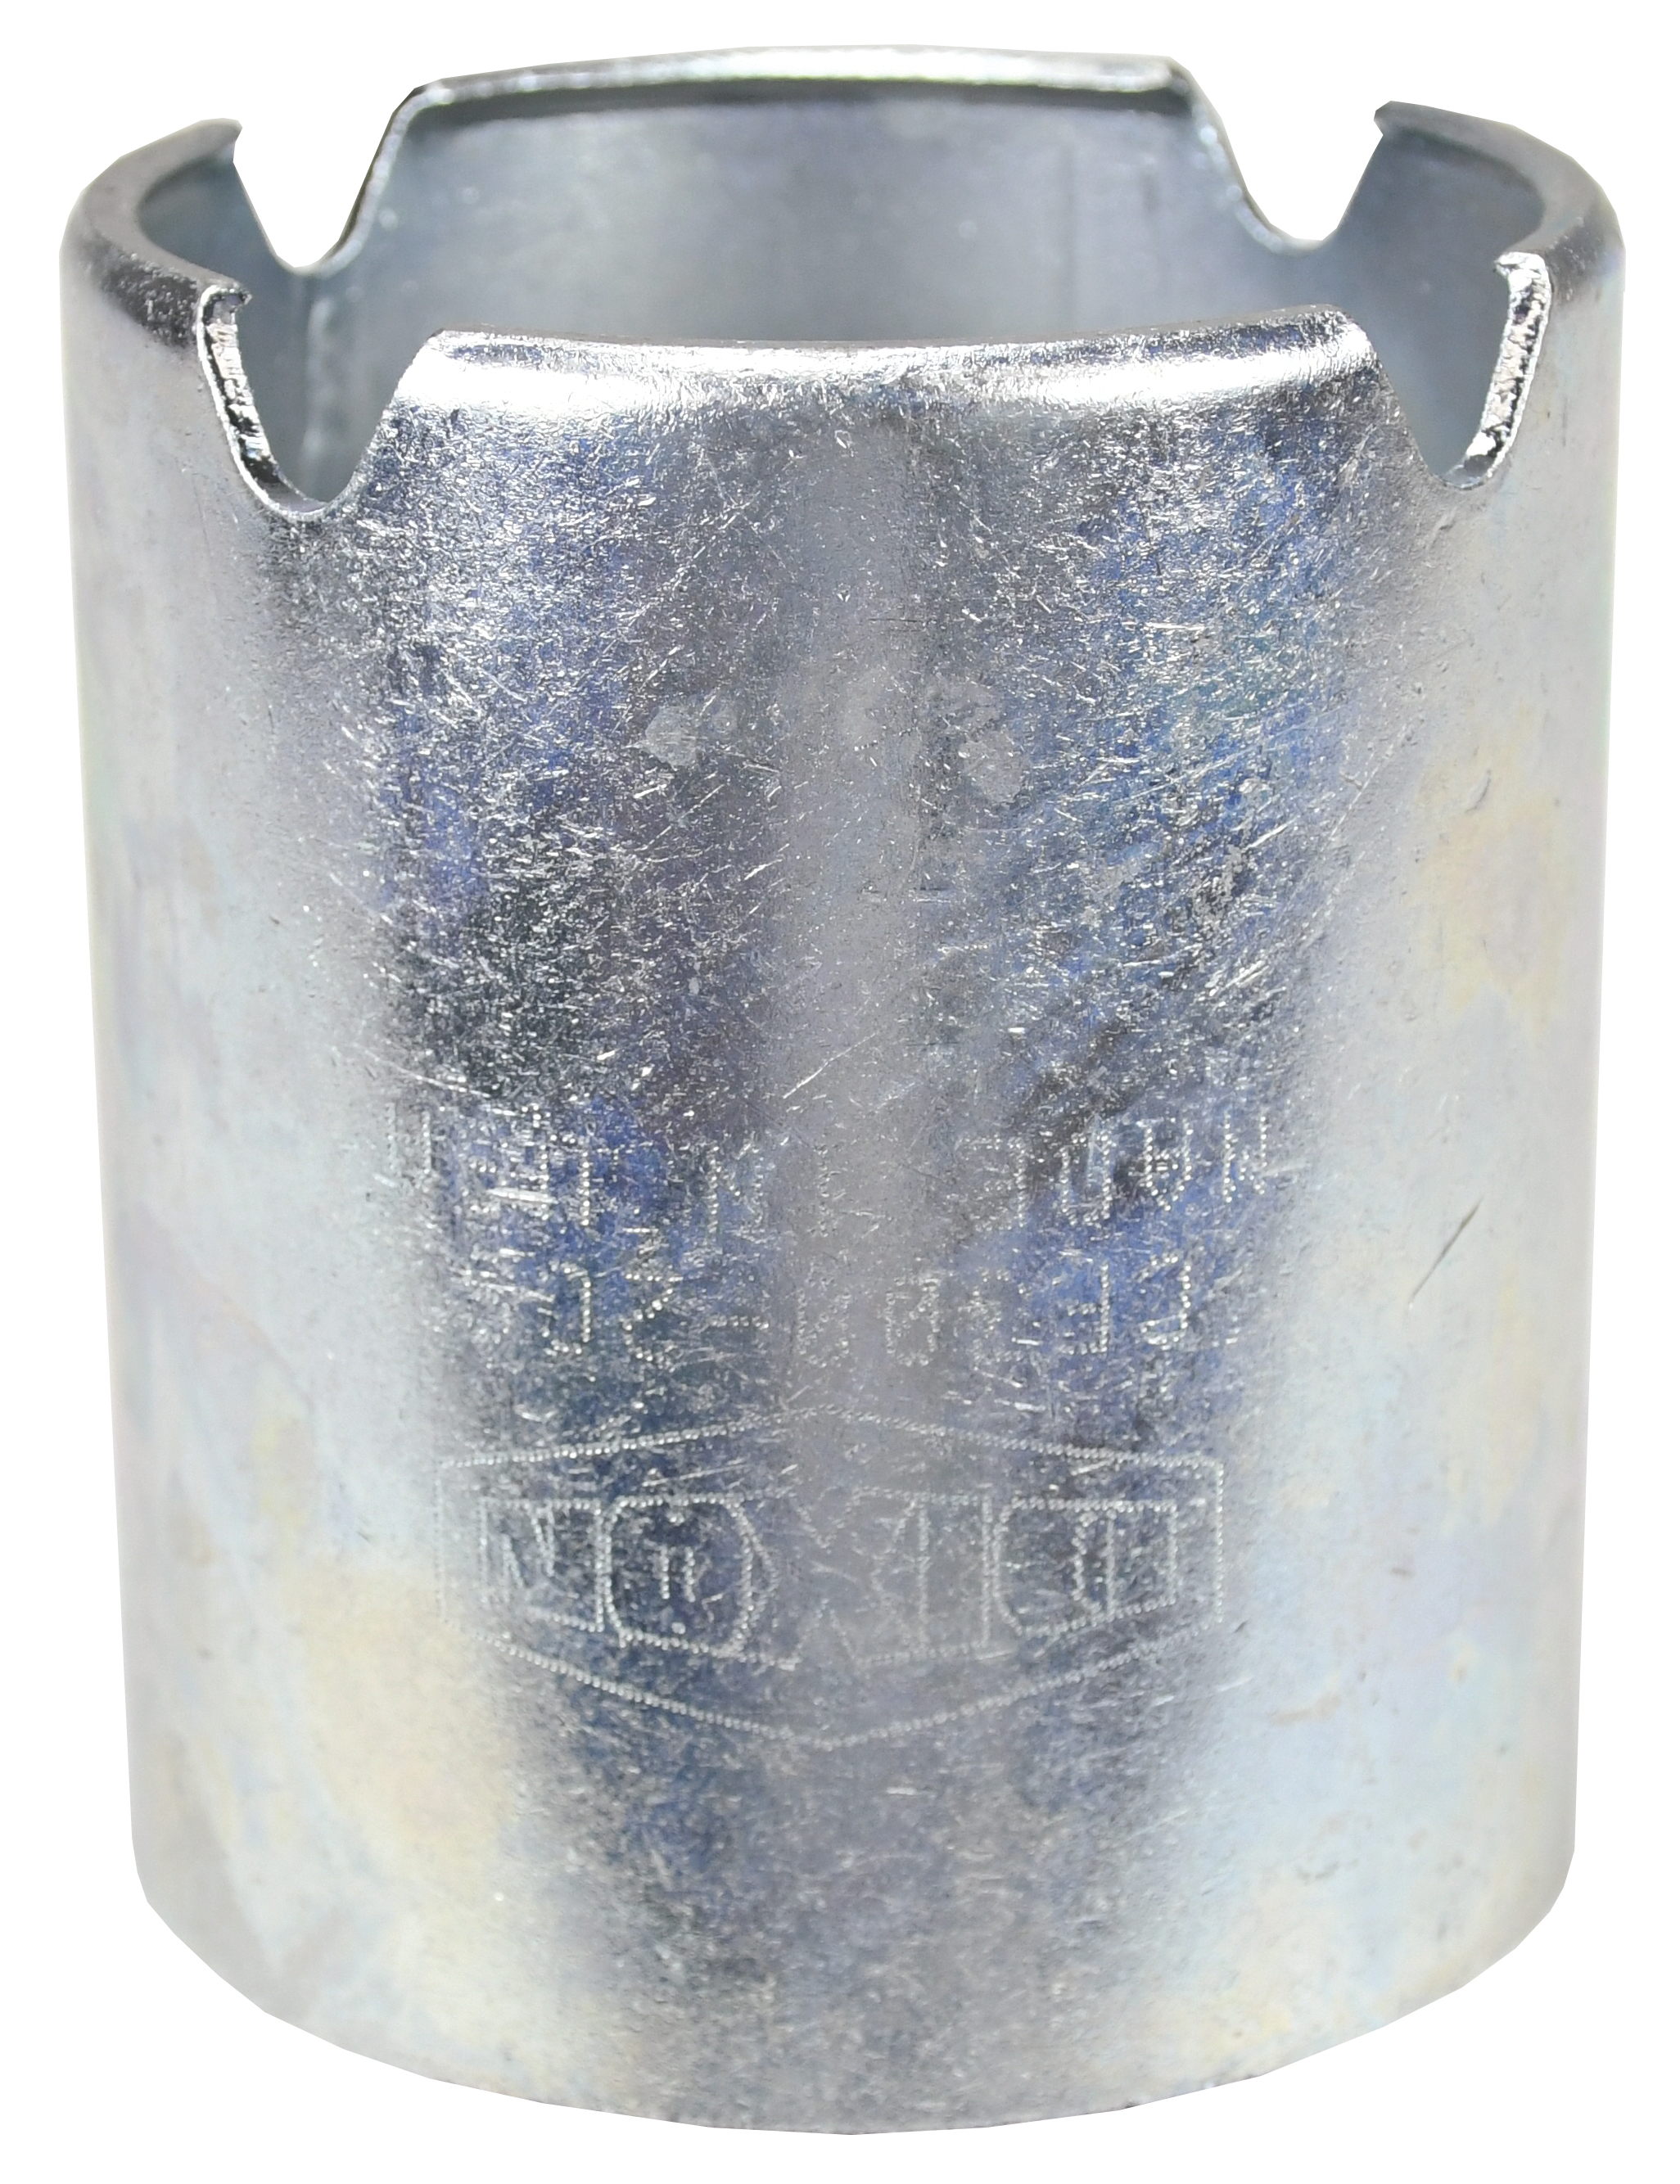 King Crimp® Style Ferrule Carbon Steel